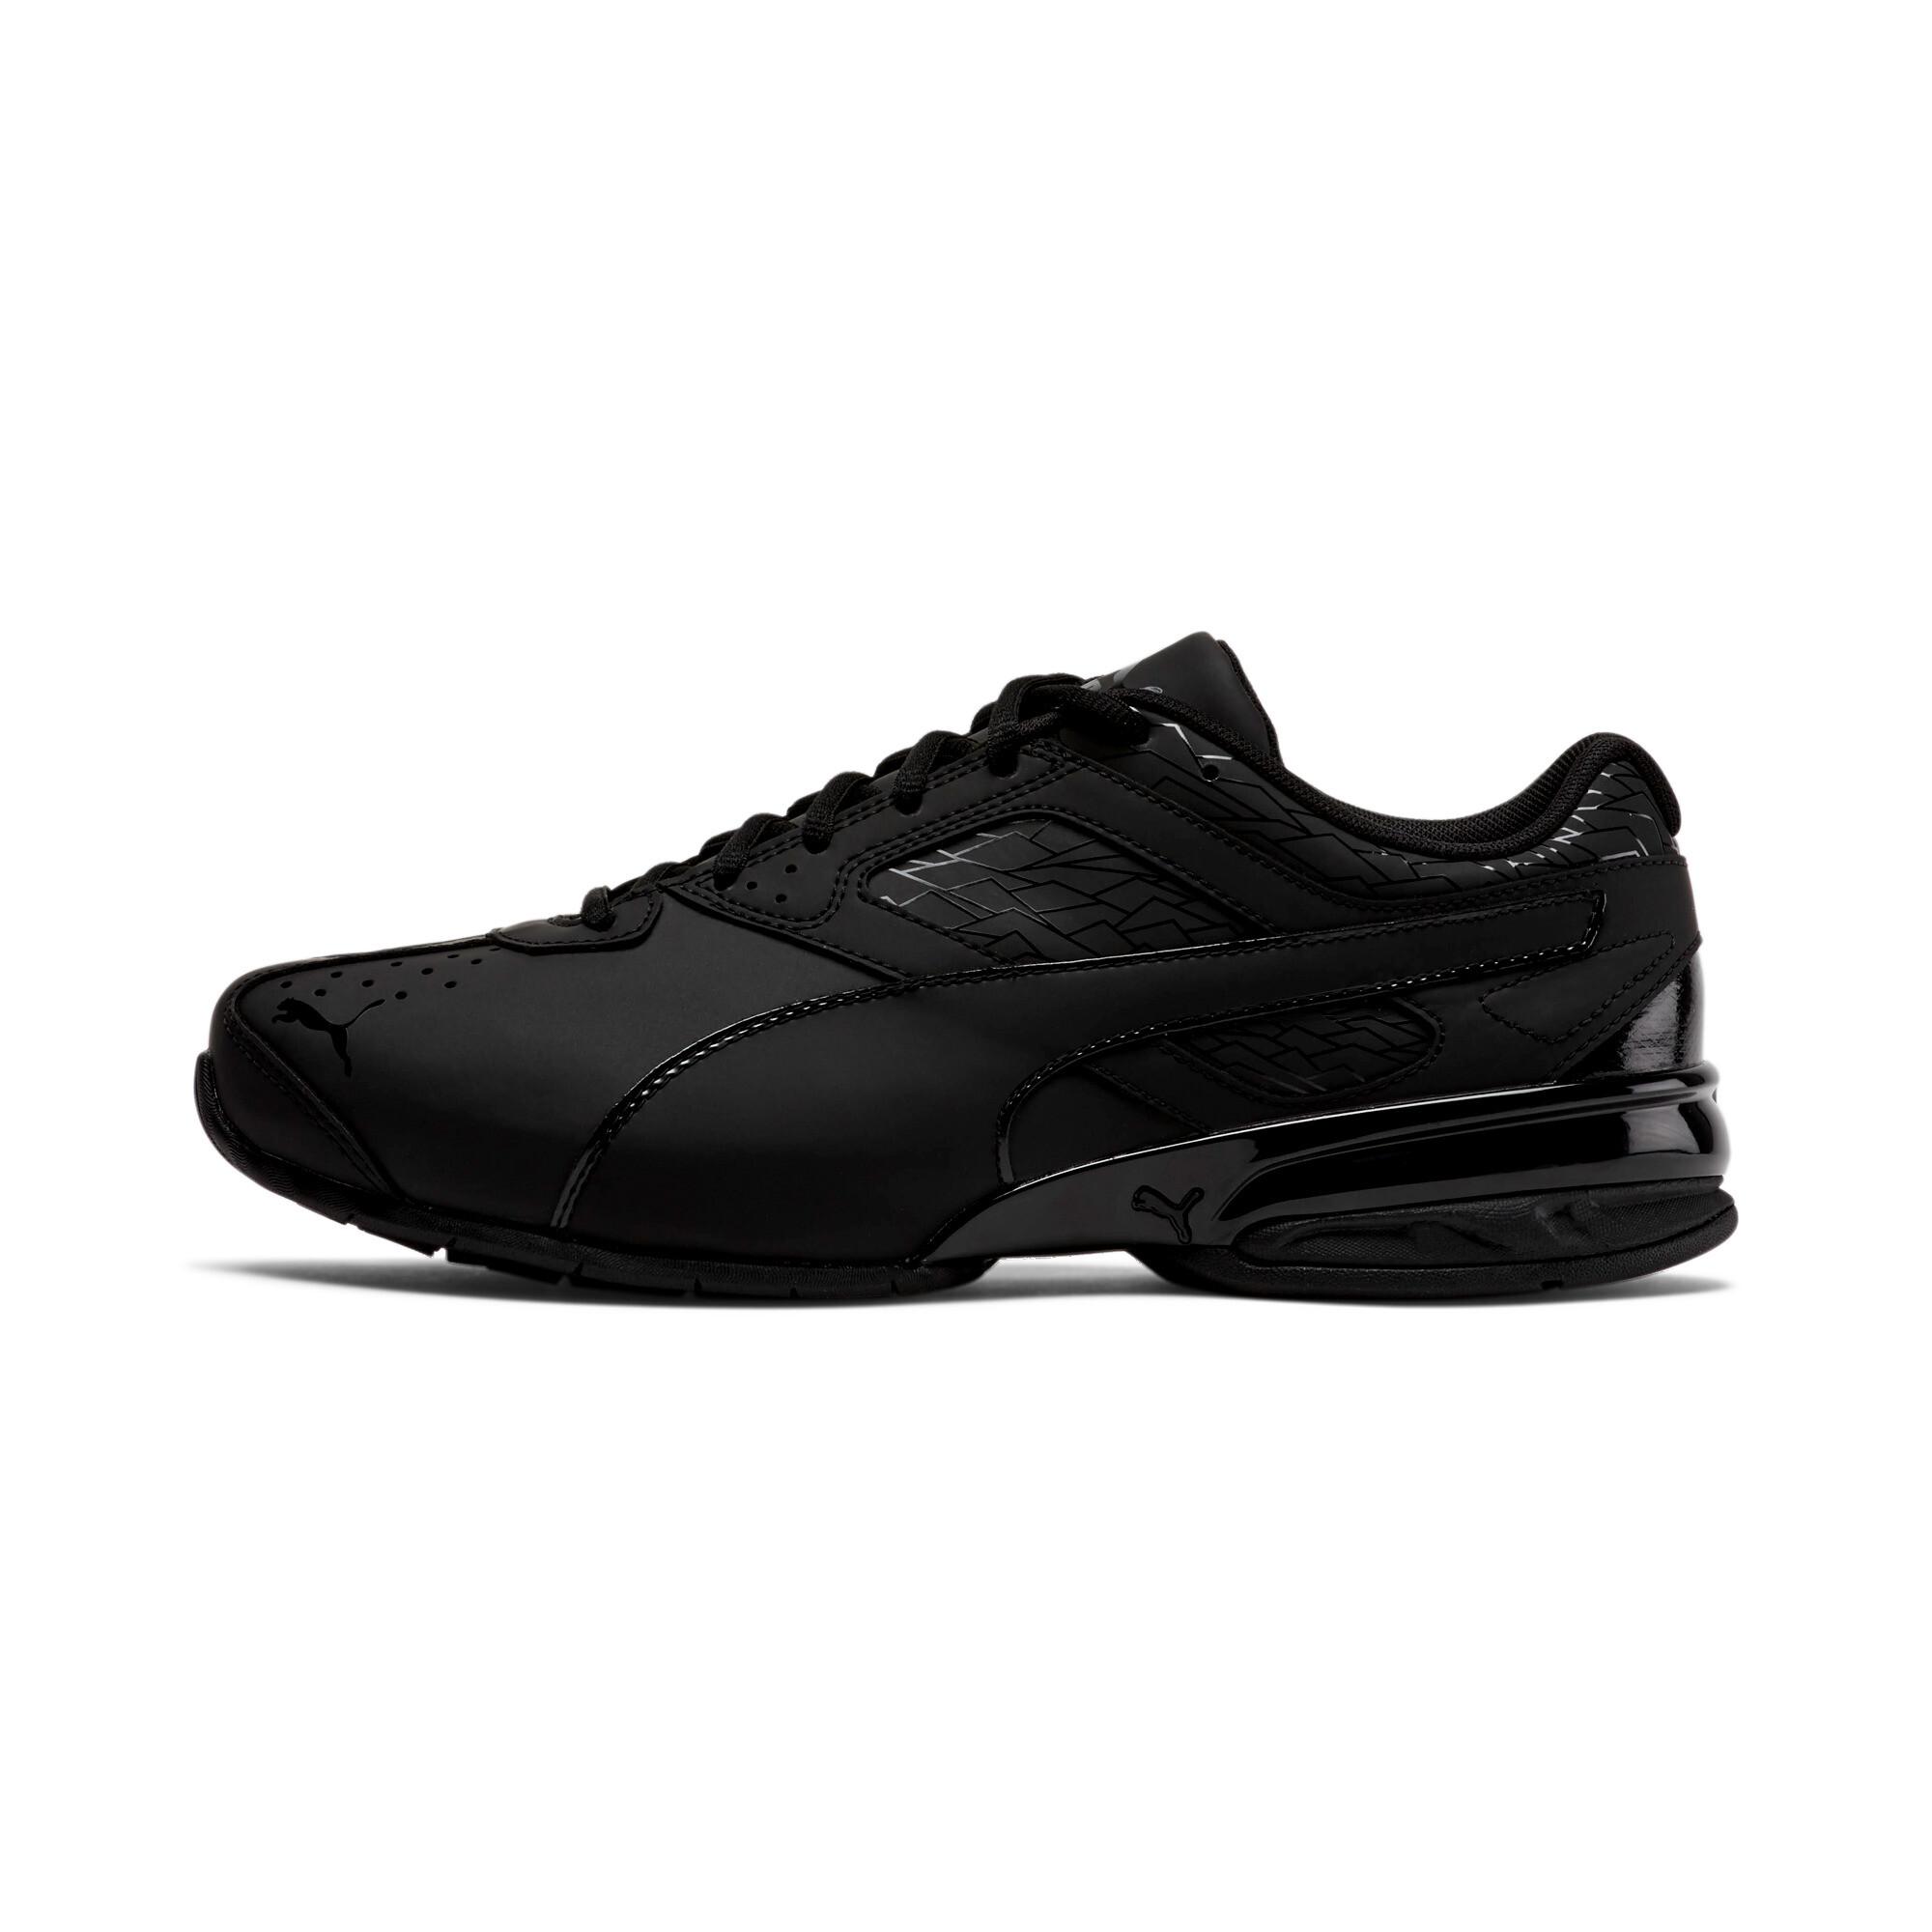 PUMA-Men-039-s-Tazon-6-Fracture-FM-Wide-Sneakers miniatura 9